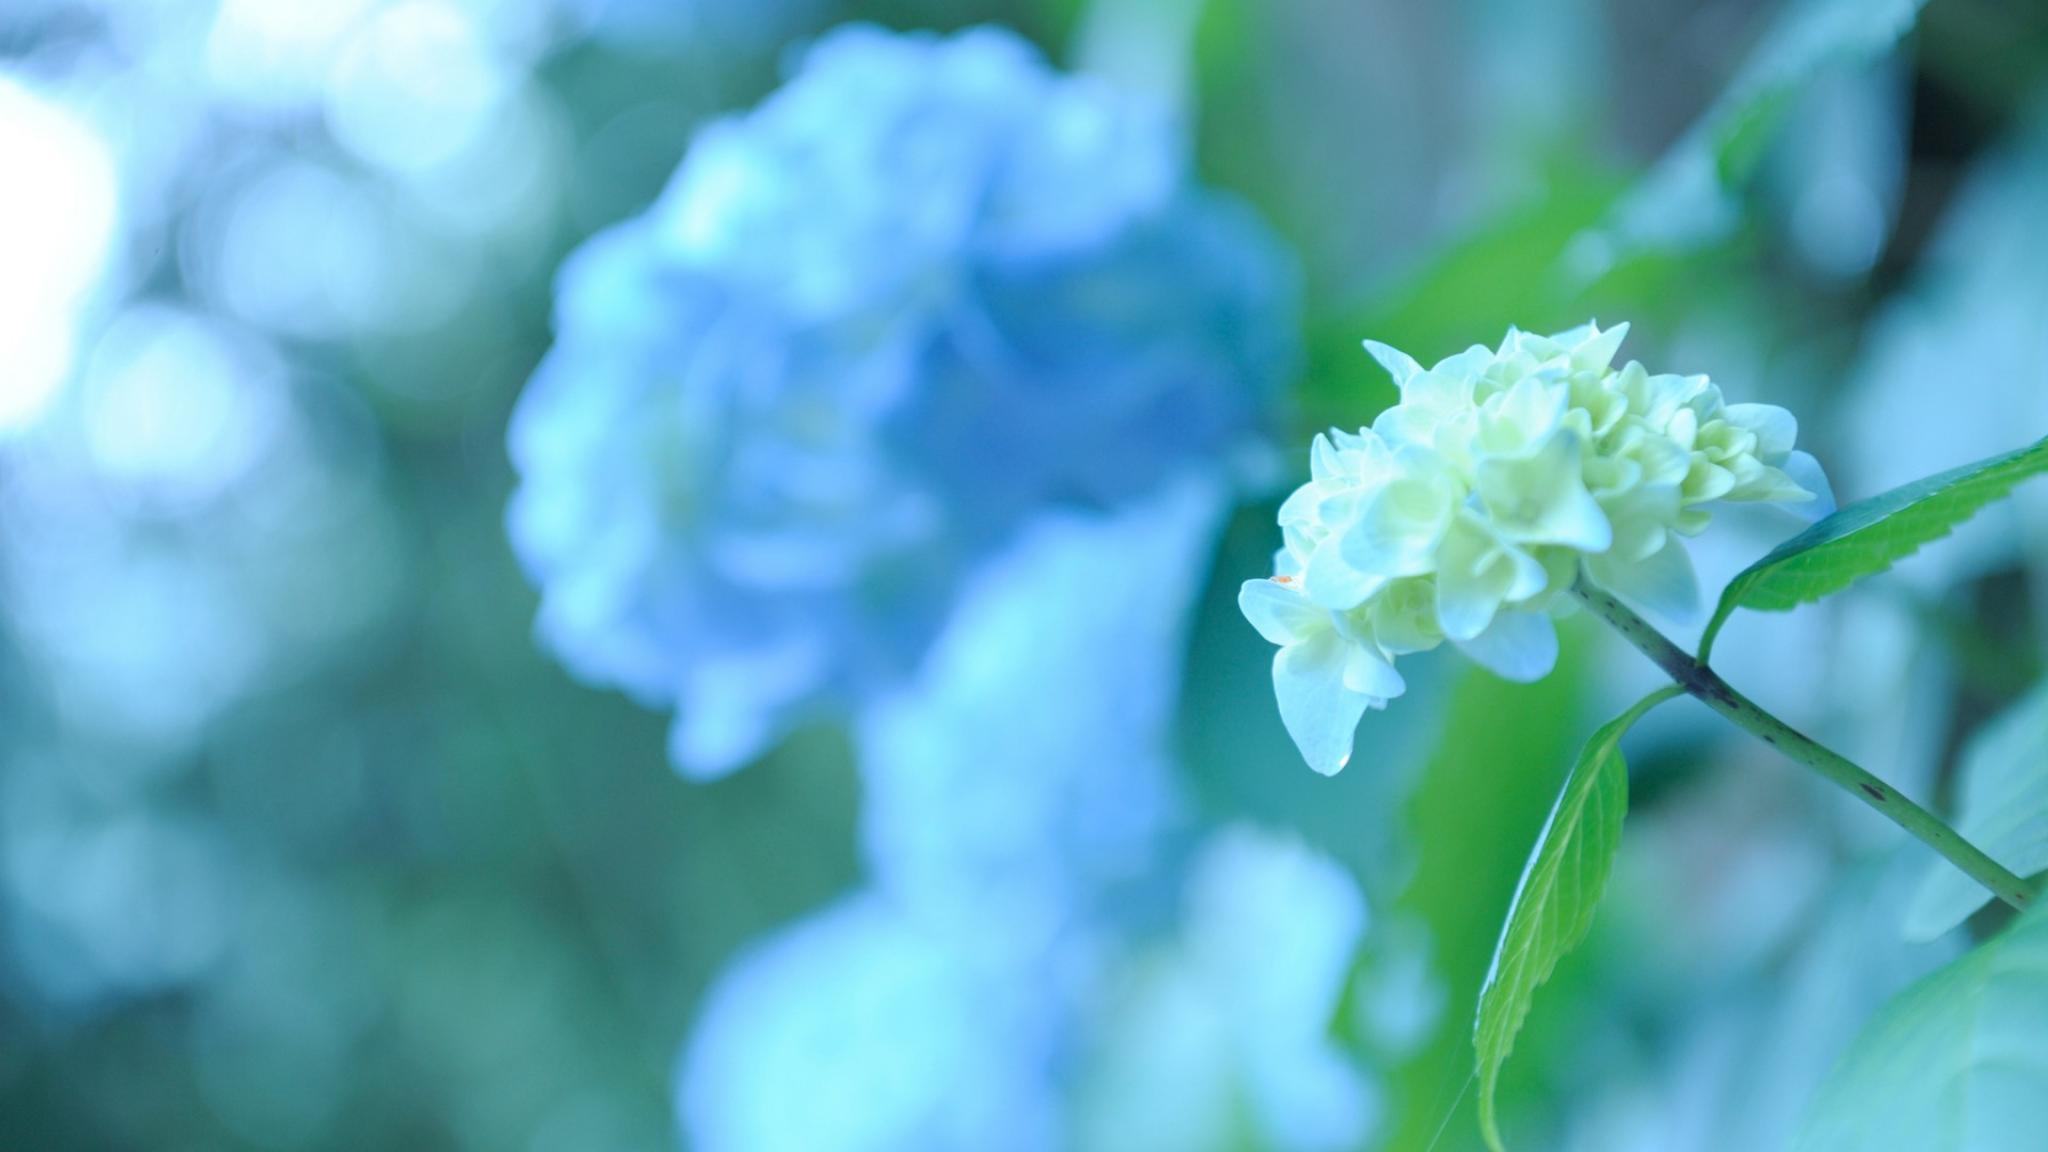 natura  fiori  macro  verde FOTO SFONDI PER DESKTOP  HD Wallpaper